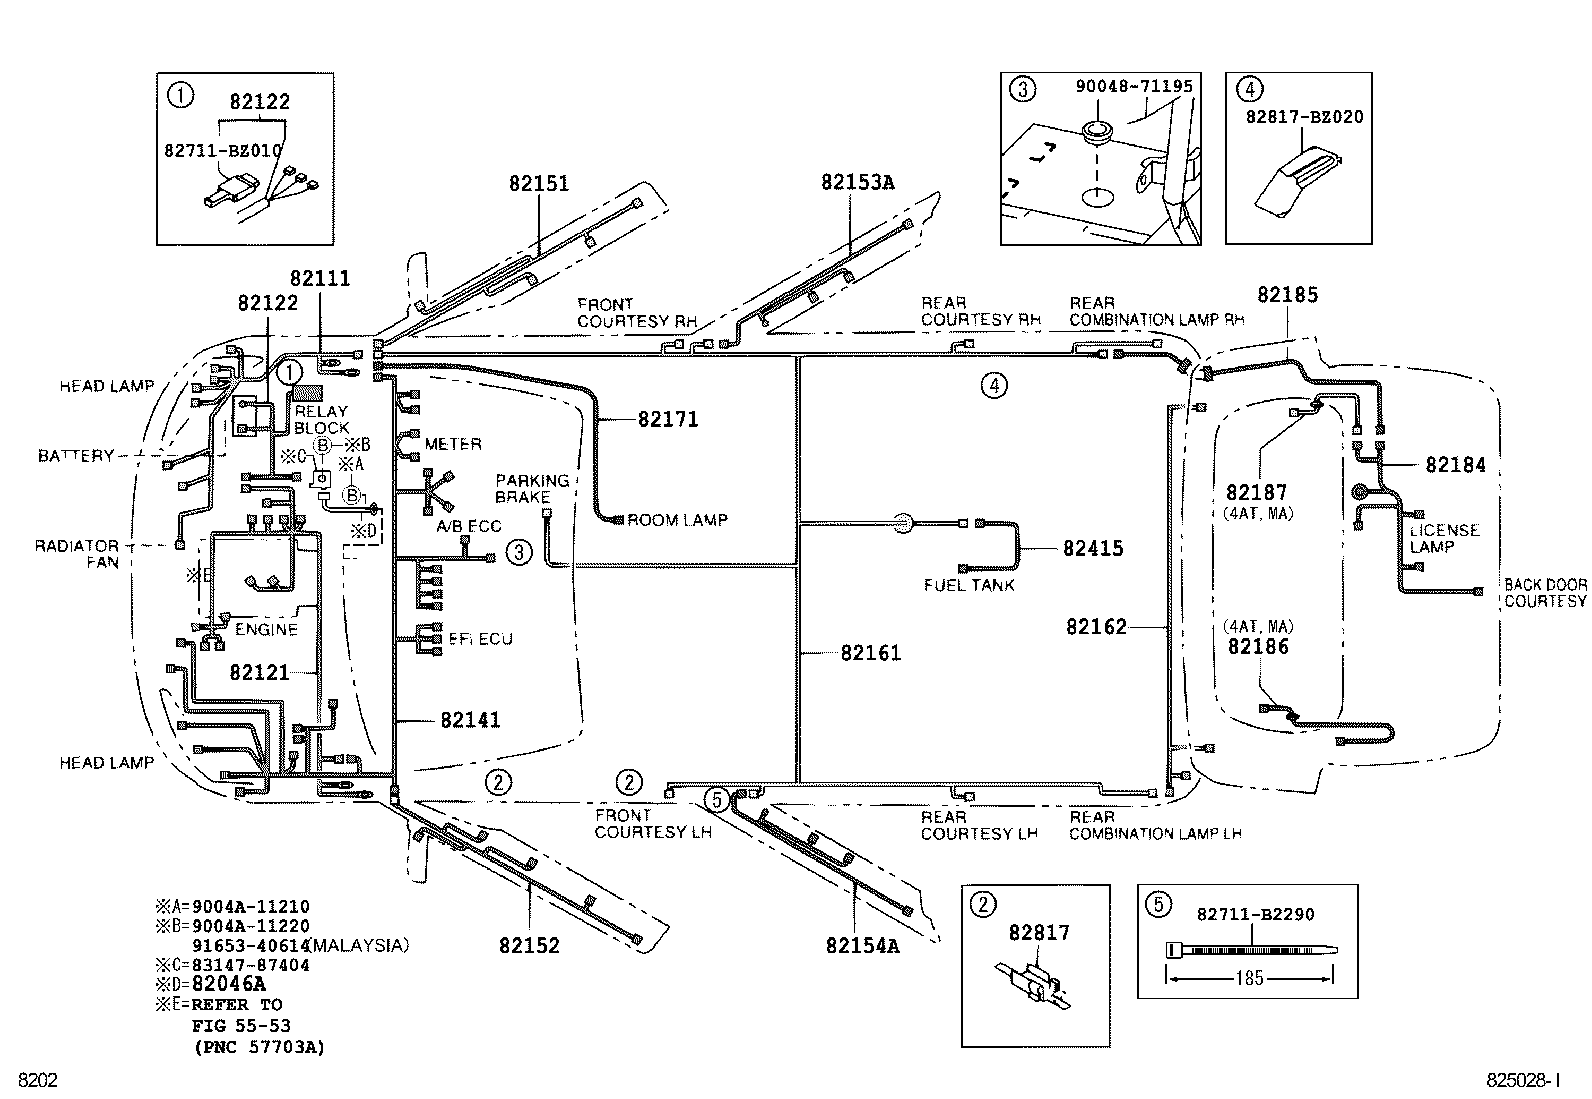 hid wiring diagram on 2010 toyota tundra